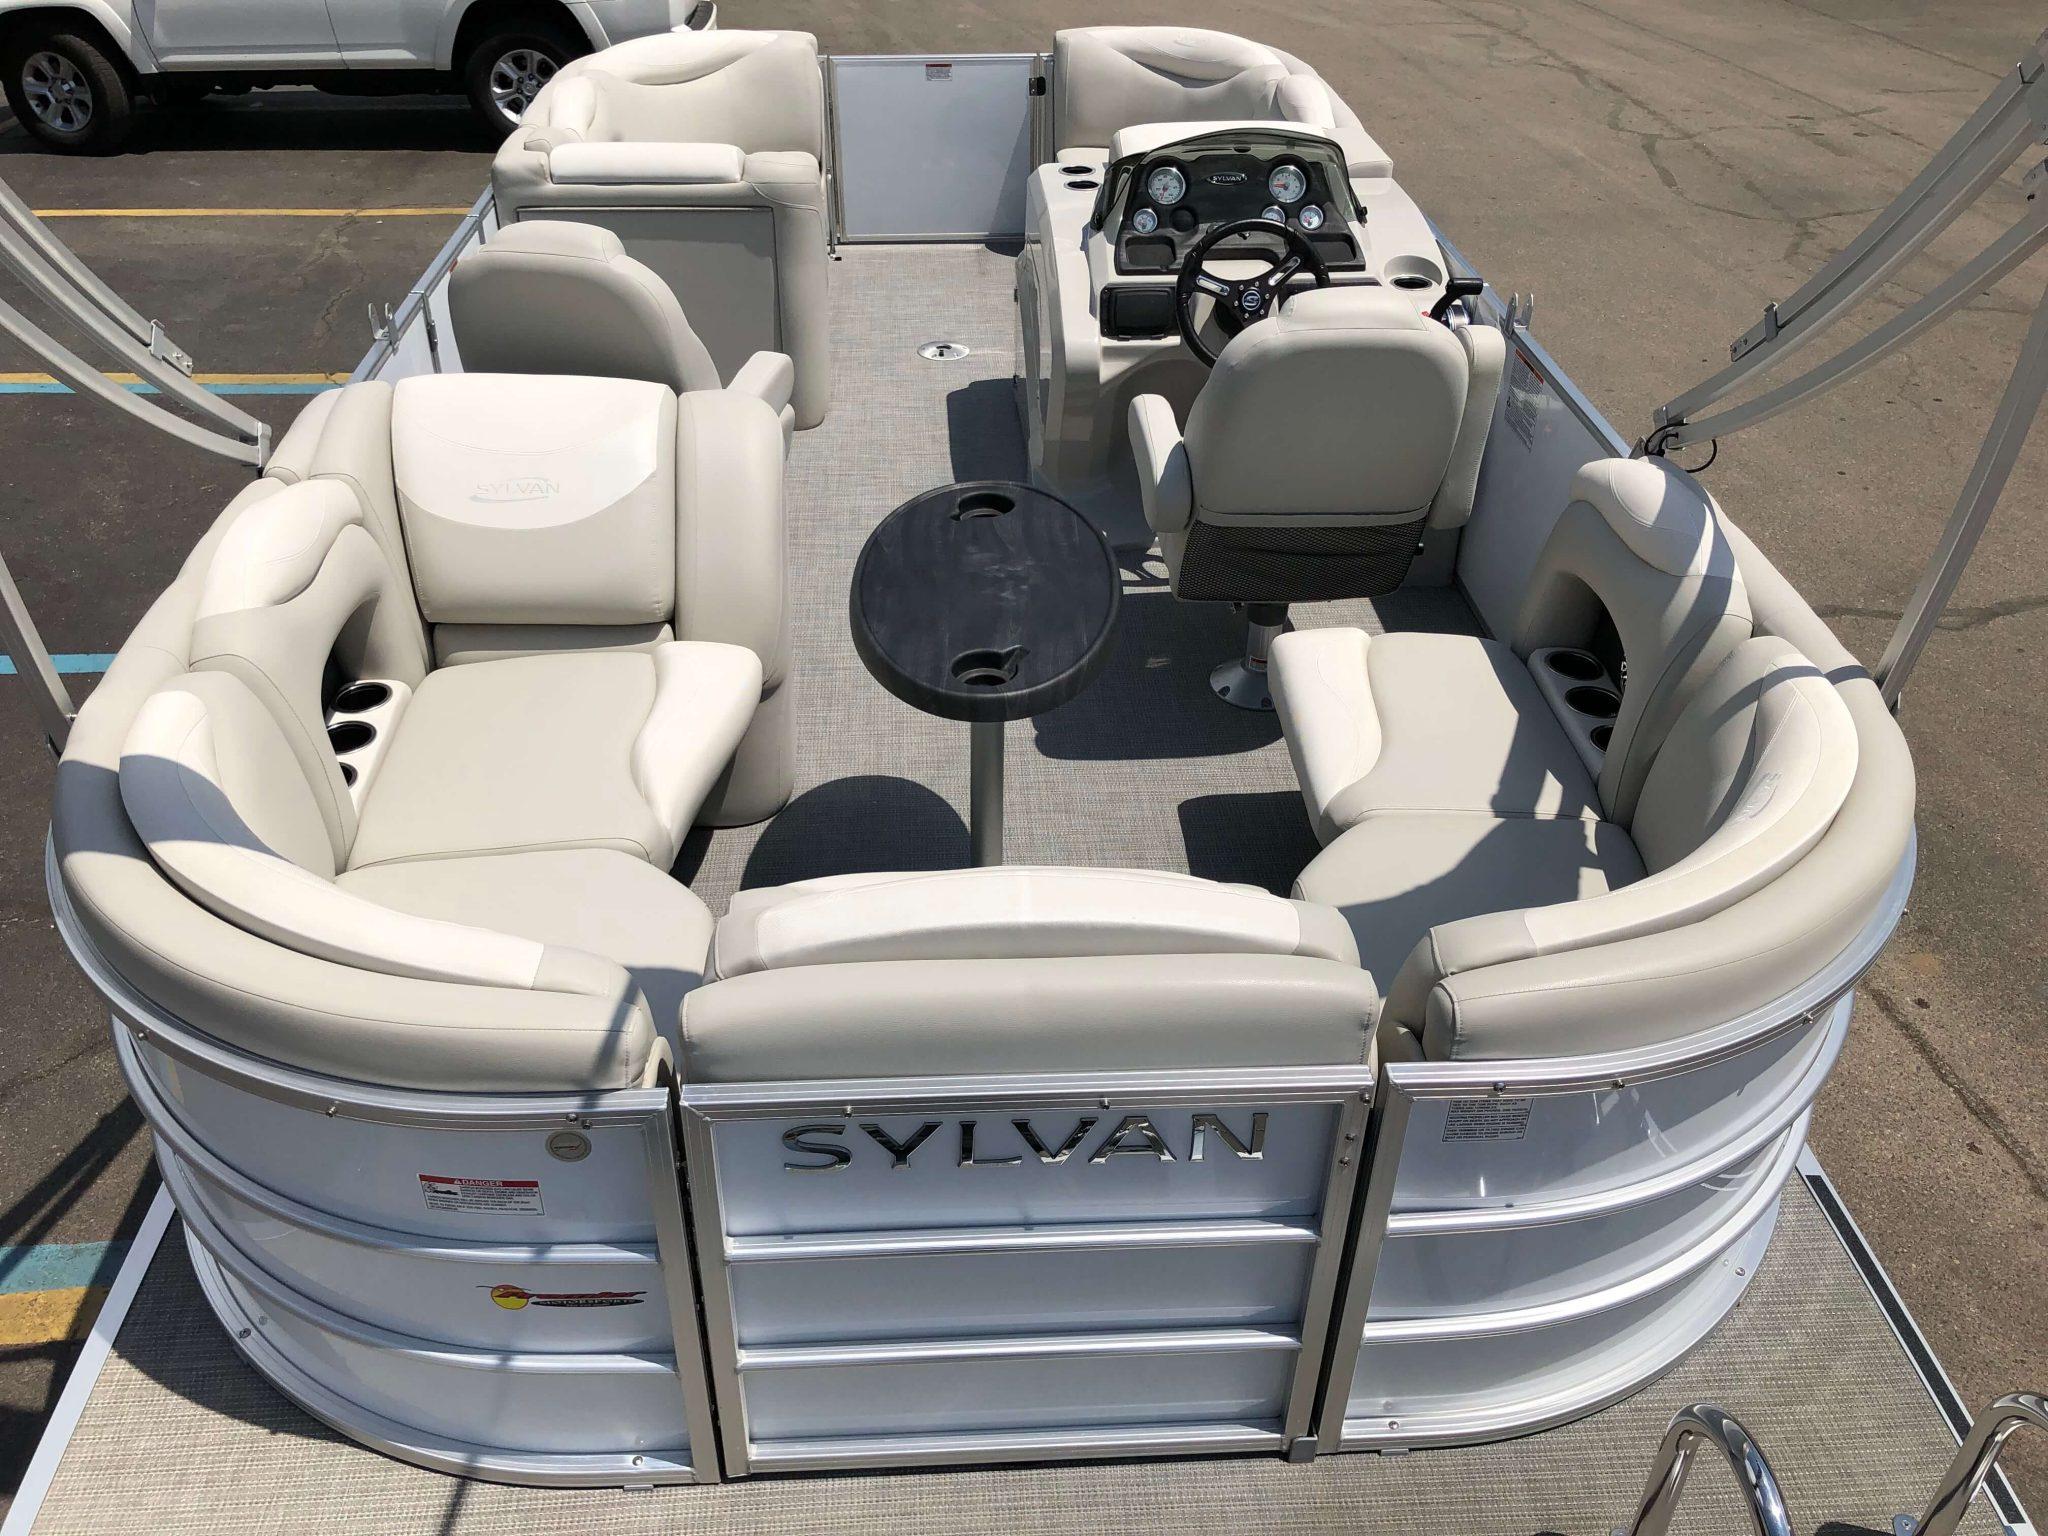 2016 Sylvan 8520 LZ LES Pontoon Boat Layout 2